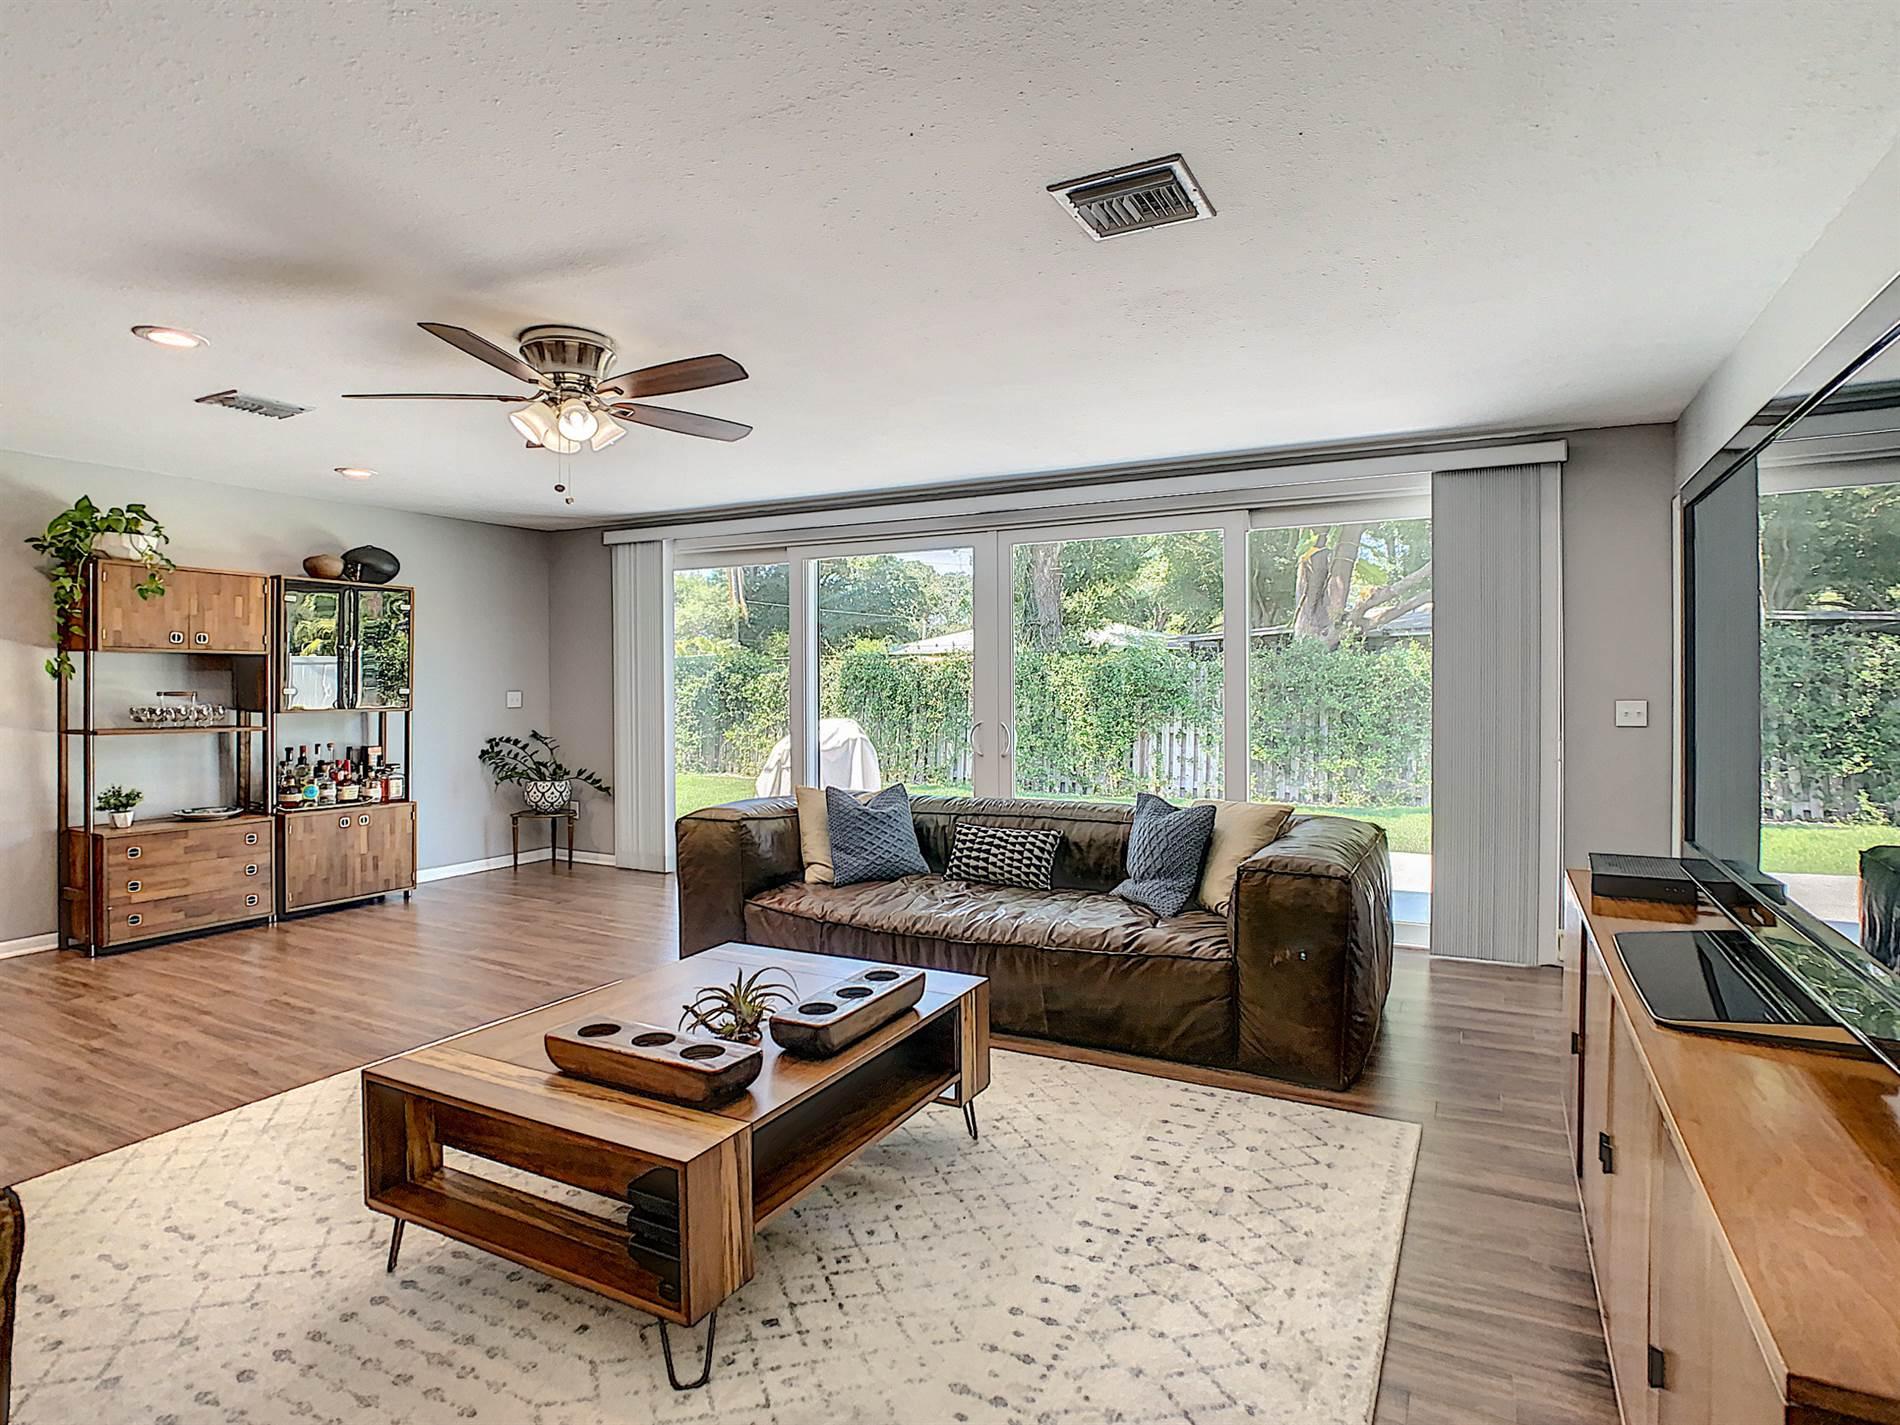 2218 Premier Drive South, Gulfport, FL 33707